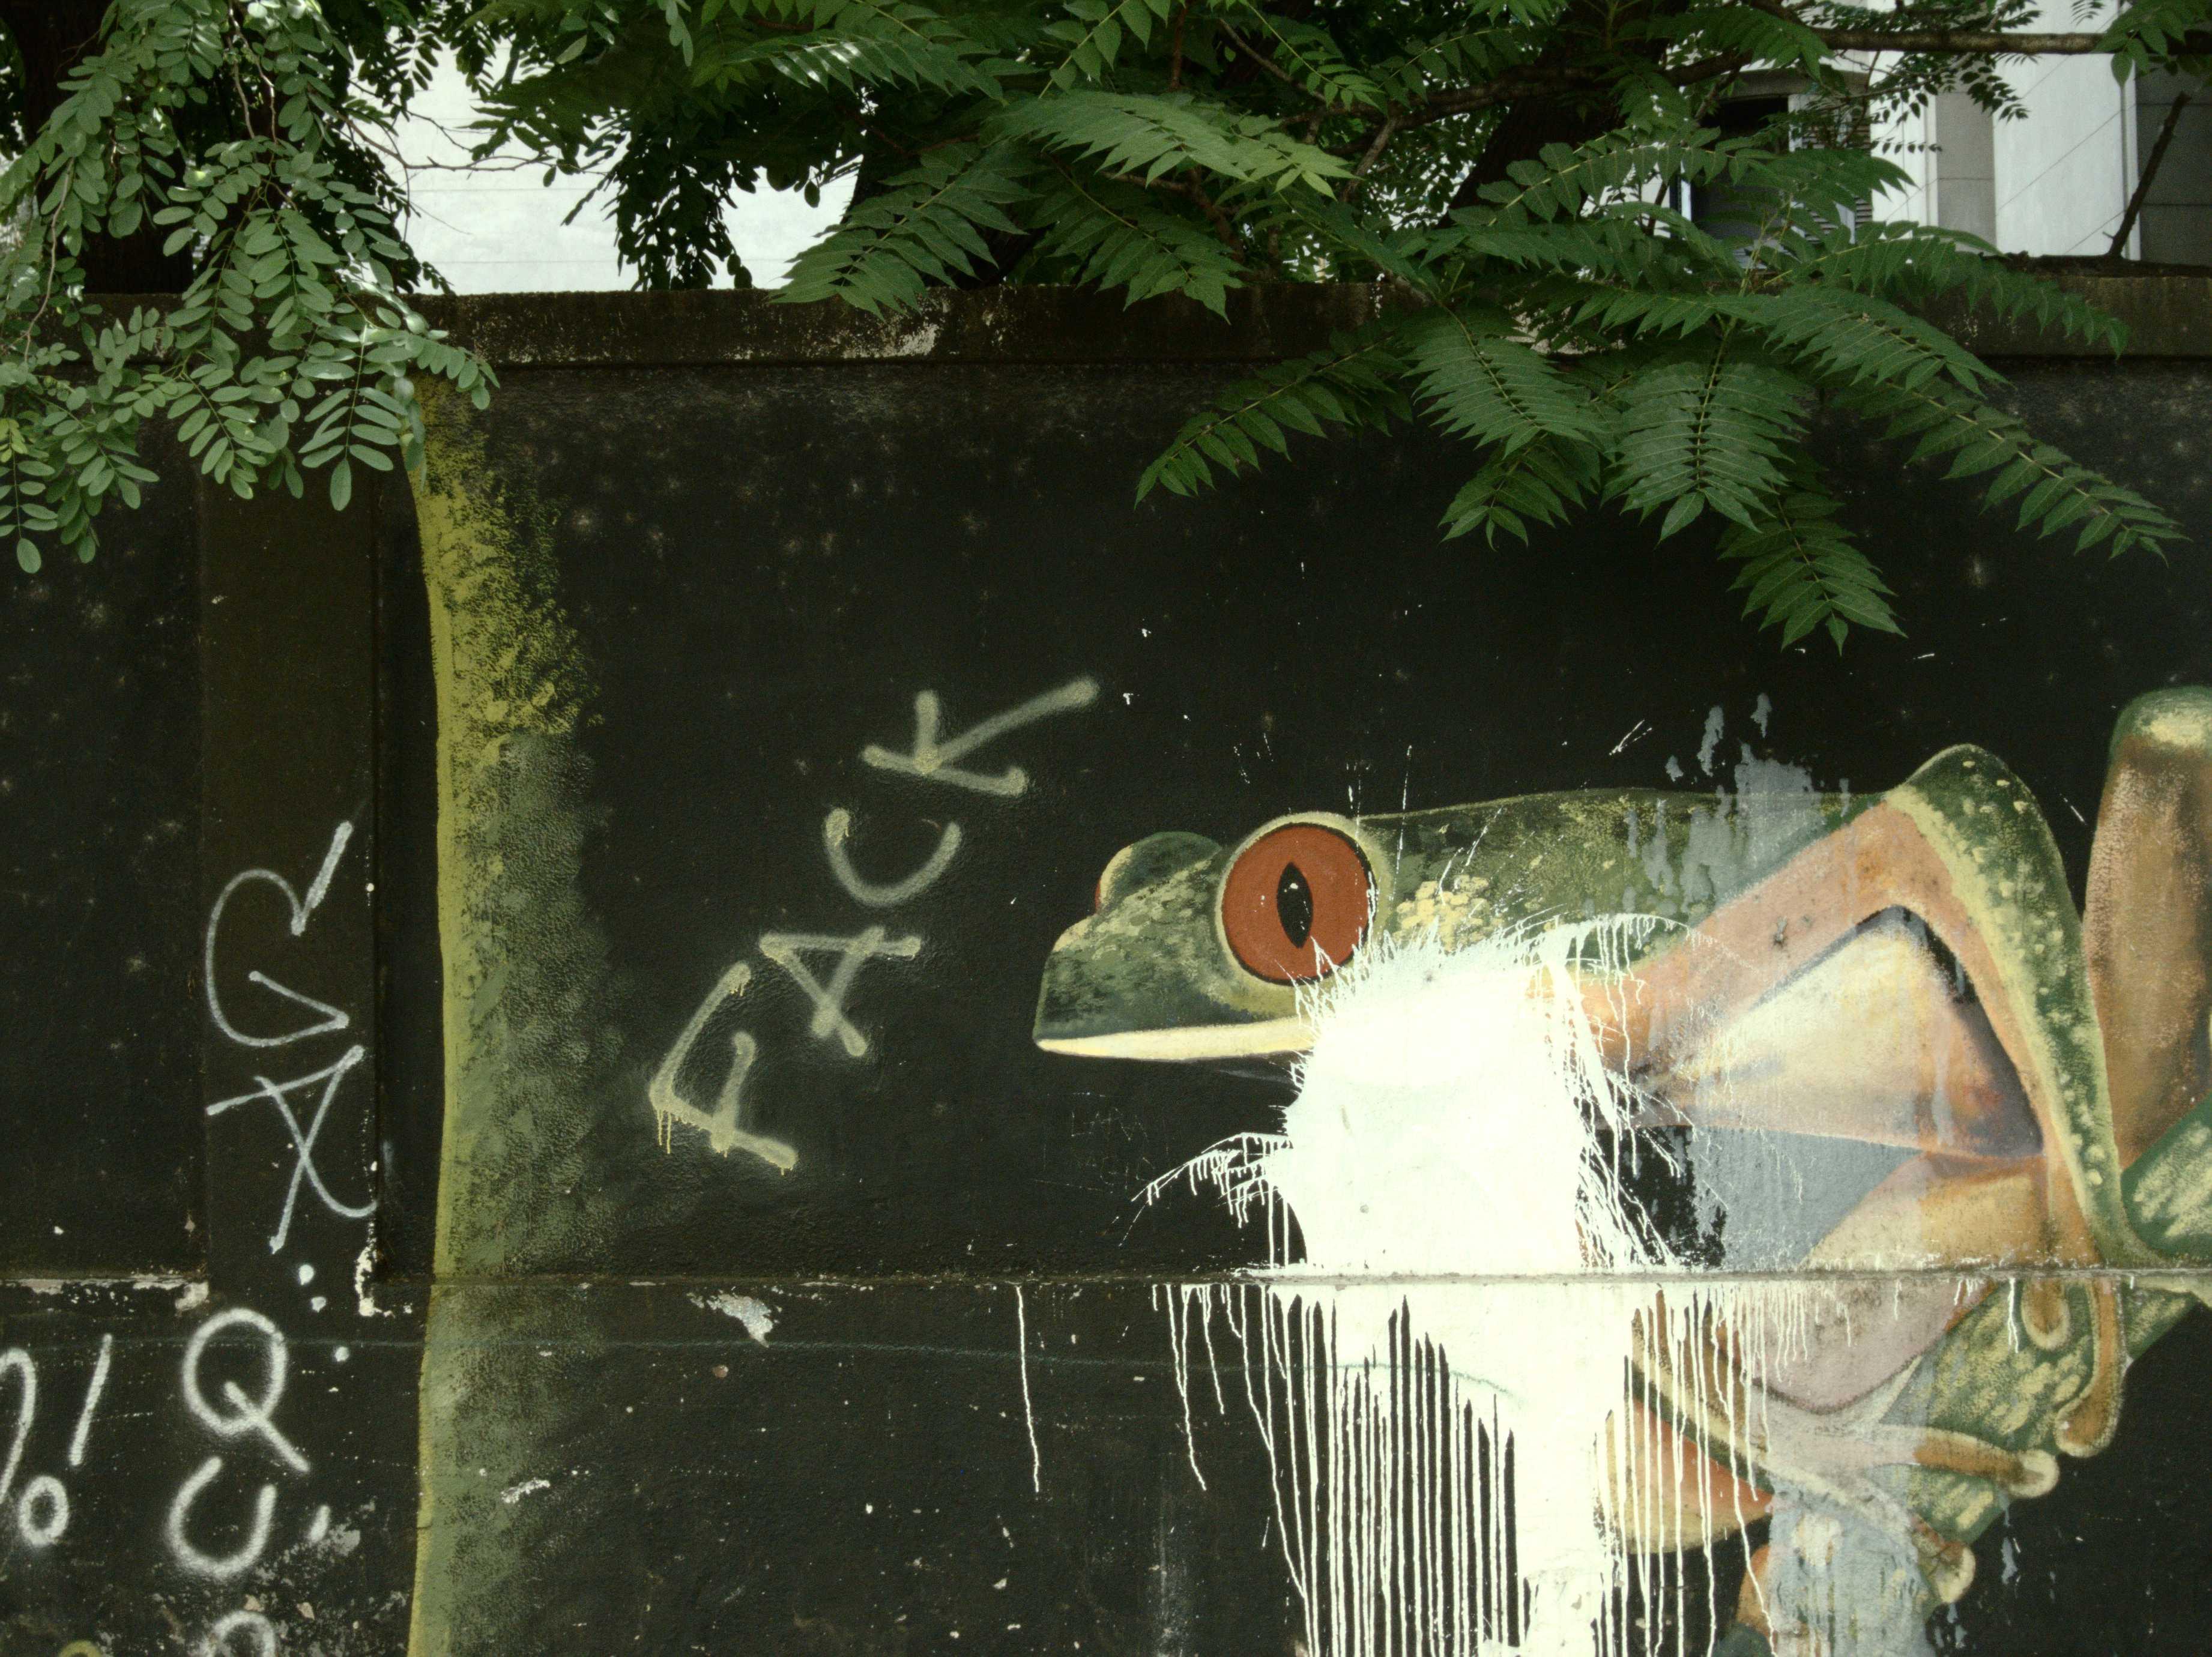 graffiti-frog